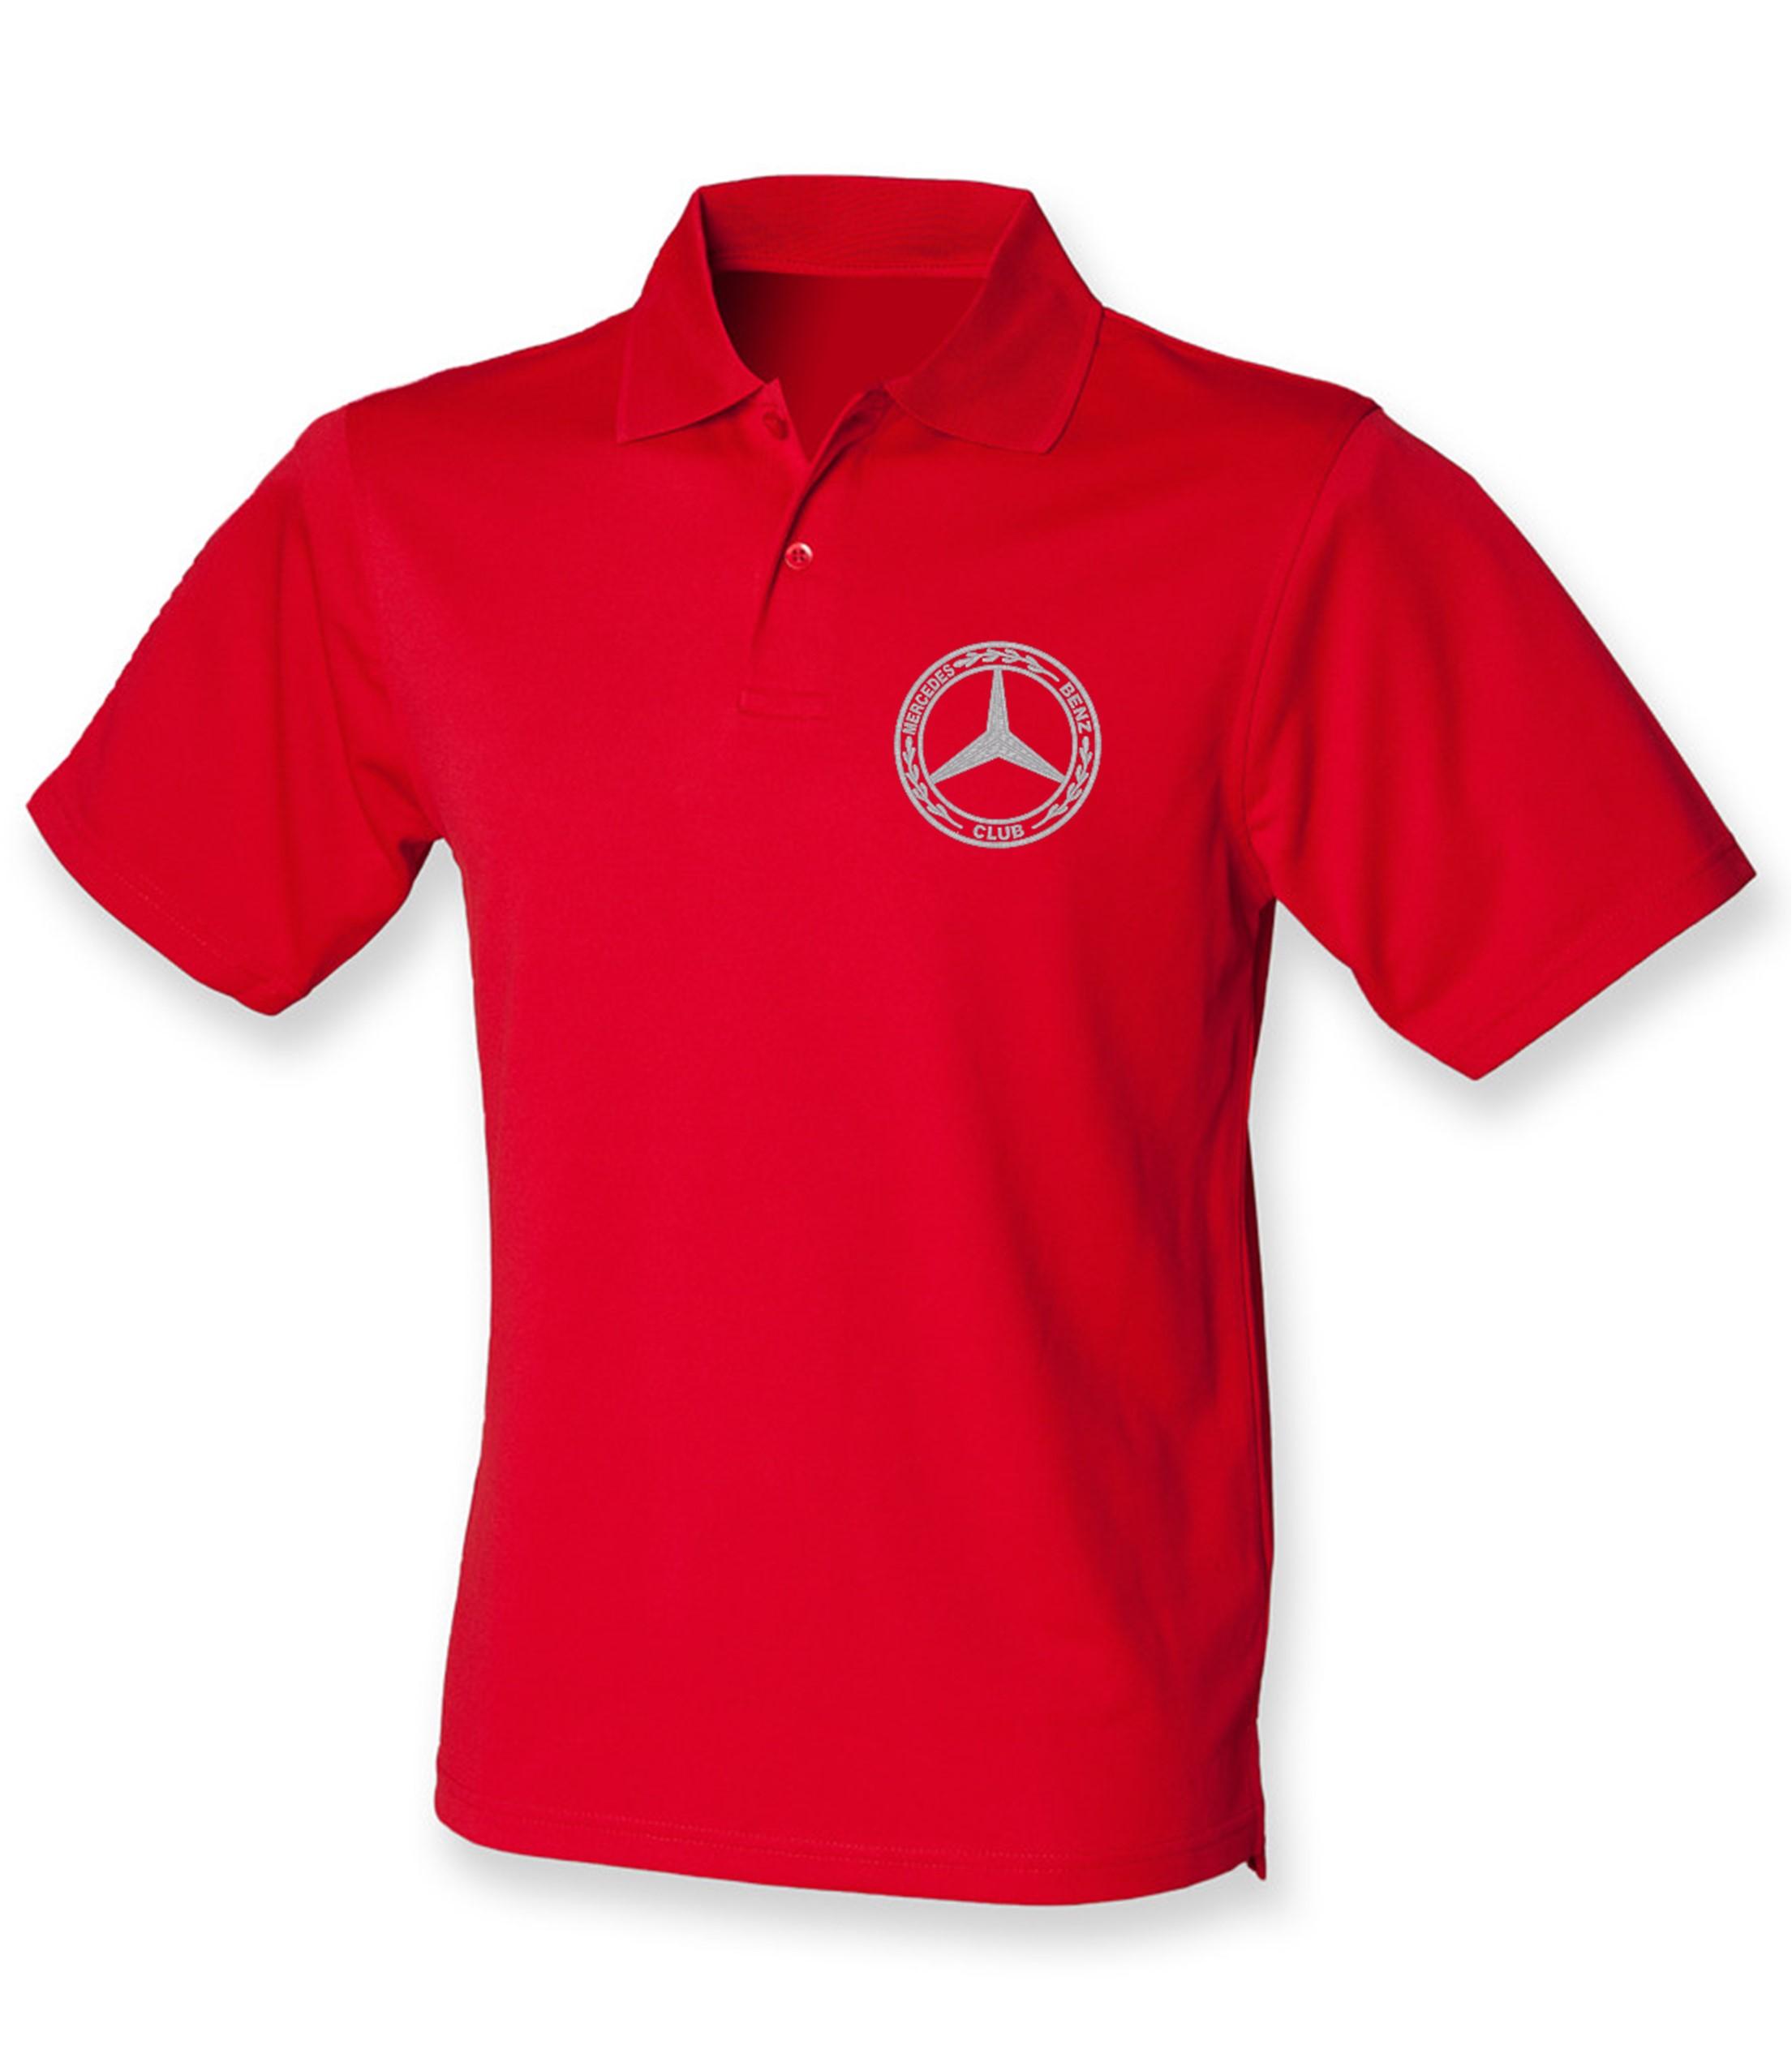 Mercedes-Benz Club Wicking Pique Polo Shirt Classic Red